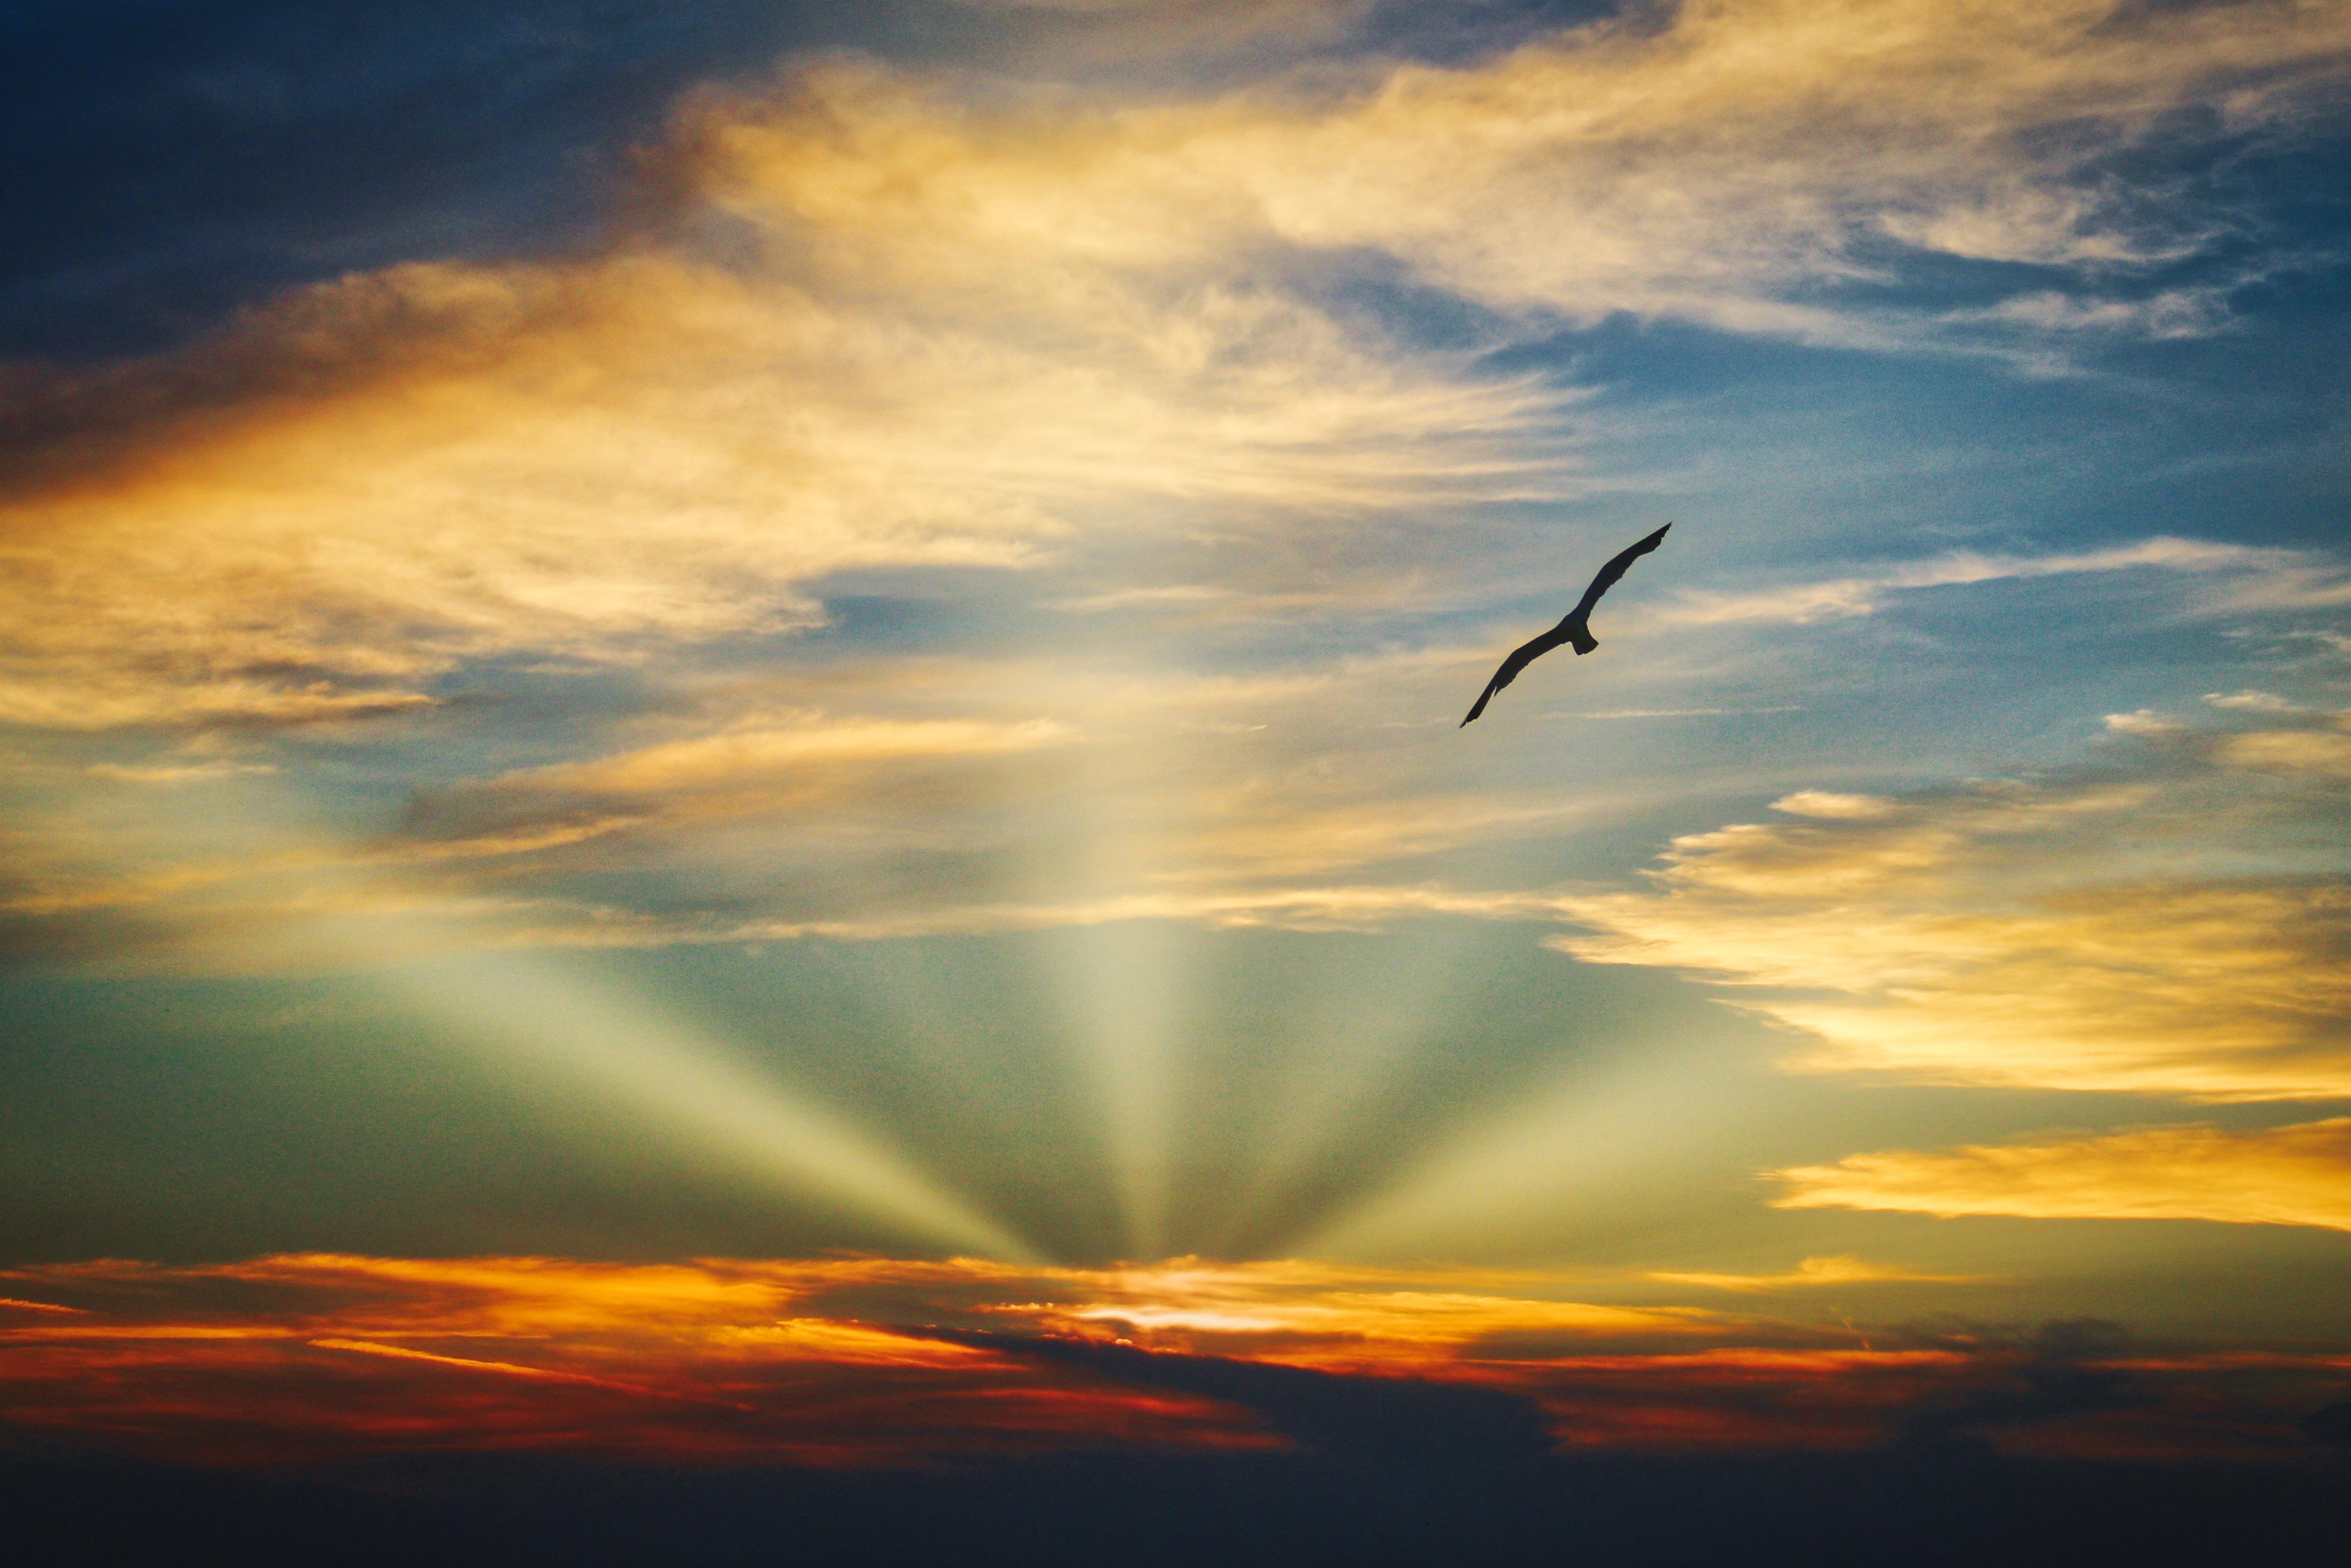 Wallpapers Hd Flying Birds Apple Animals Blue Sky Desktop: Bird Flying Sunset Evening View Clouds Beautiful Sky 5k